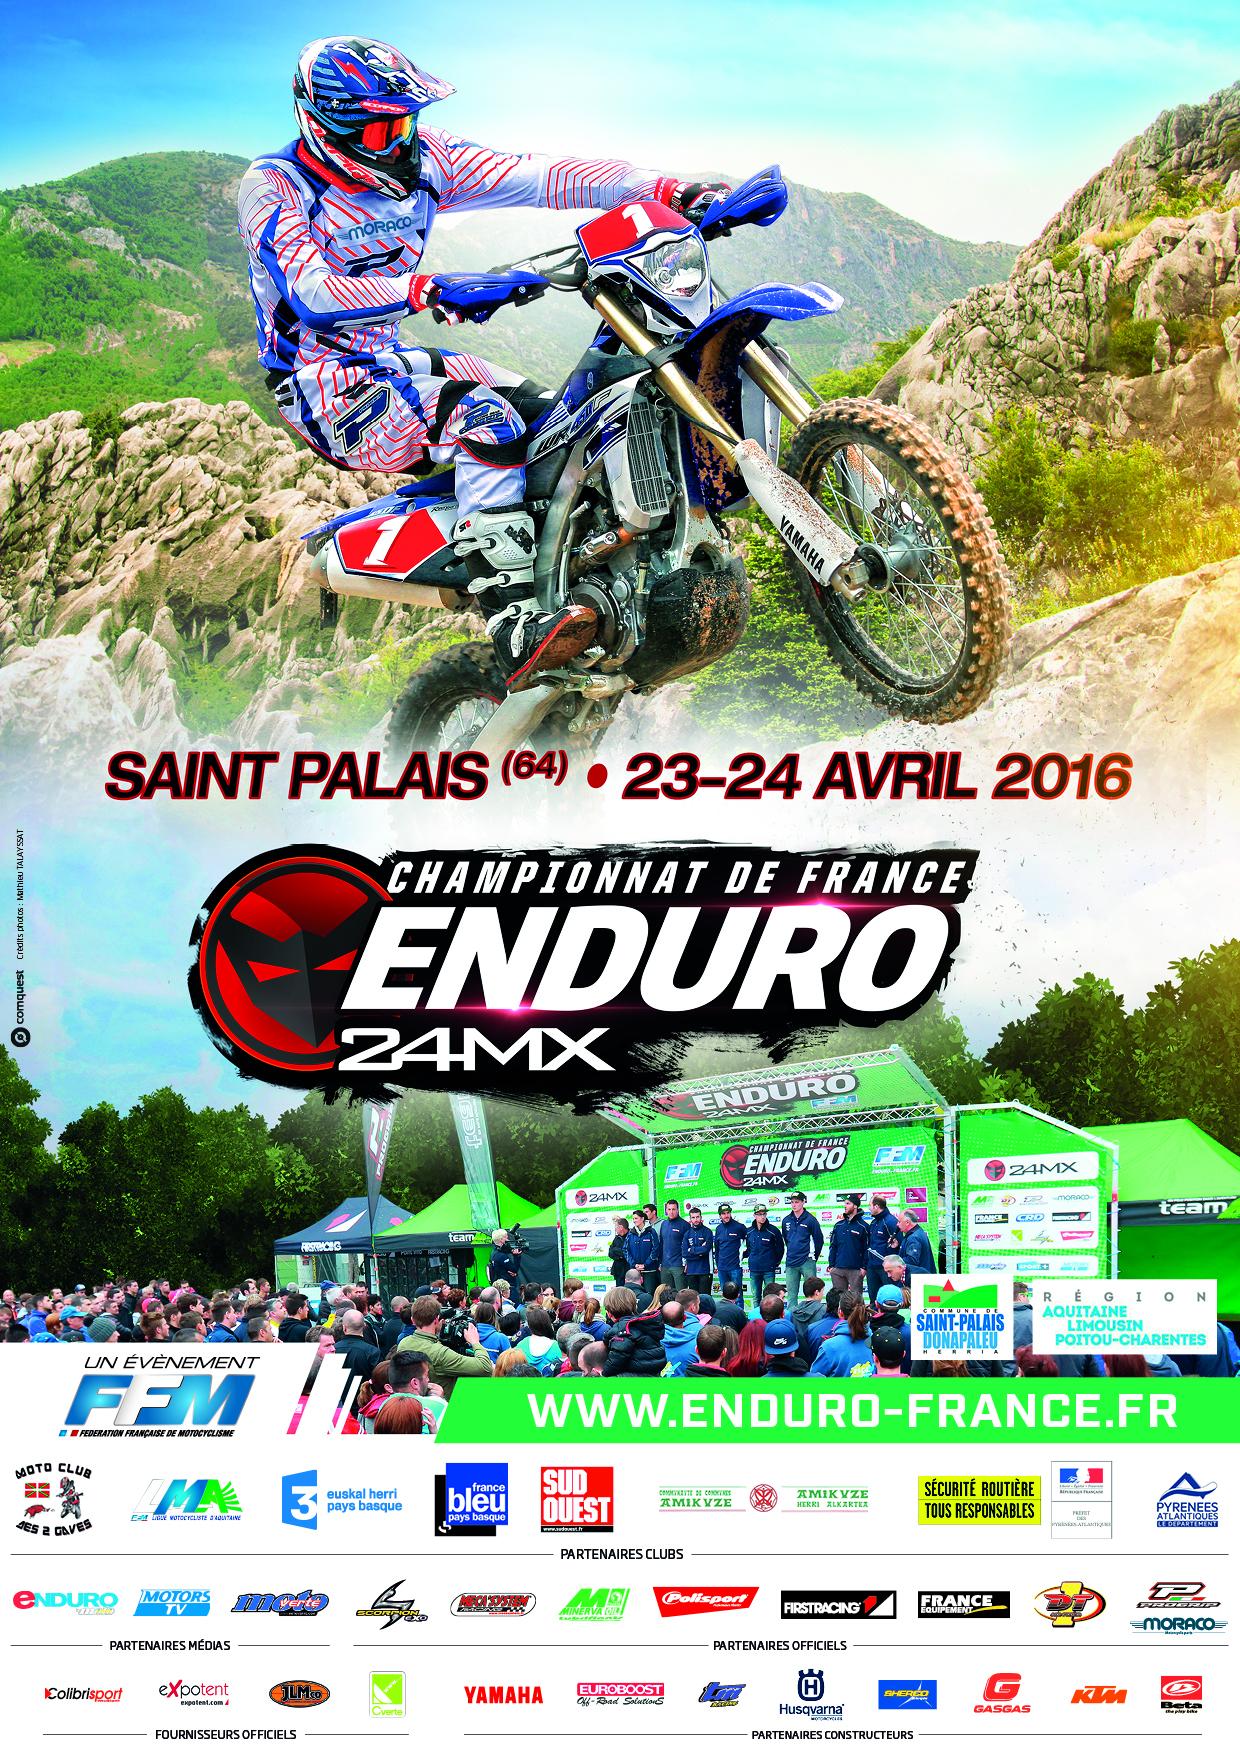 FFM_ENDURO_2016_A4_ST_PALAIS_V6